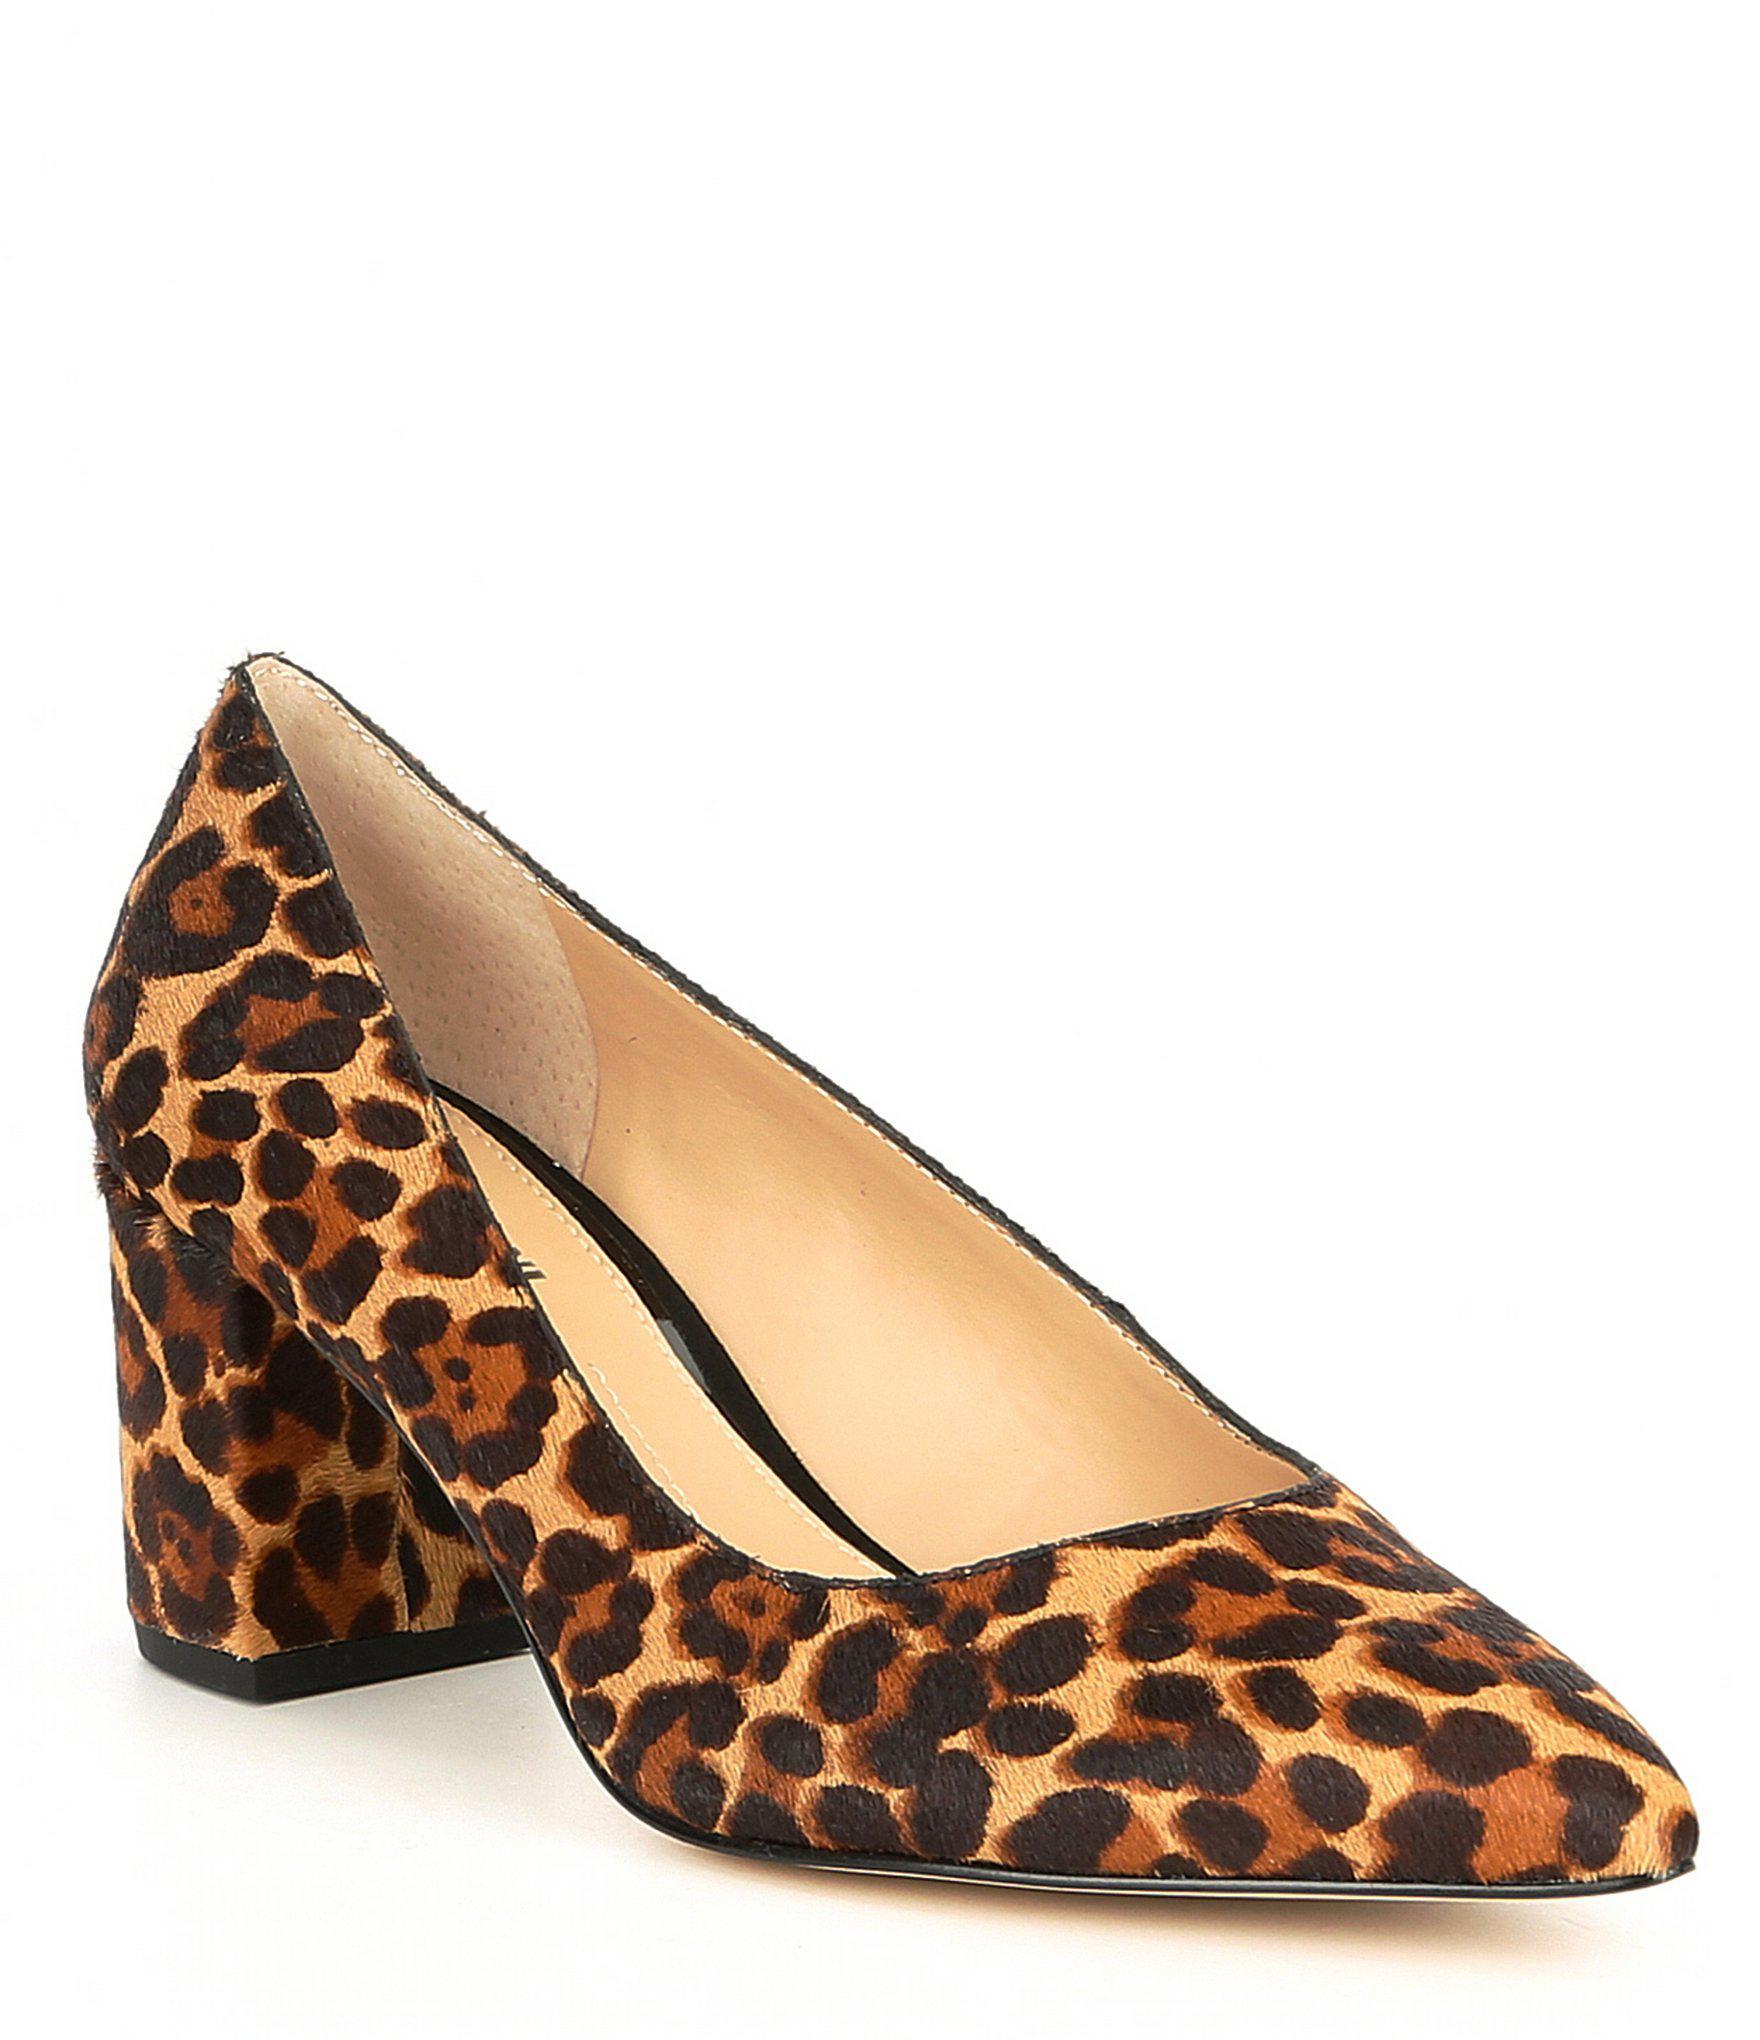 01fe3f005ce Gianni Bini Delancy Leopard Print Block Heel Pumps in Brown - Lyst